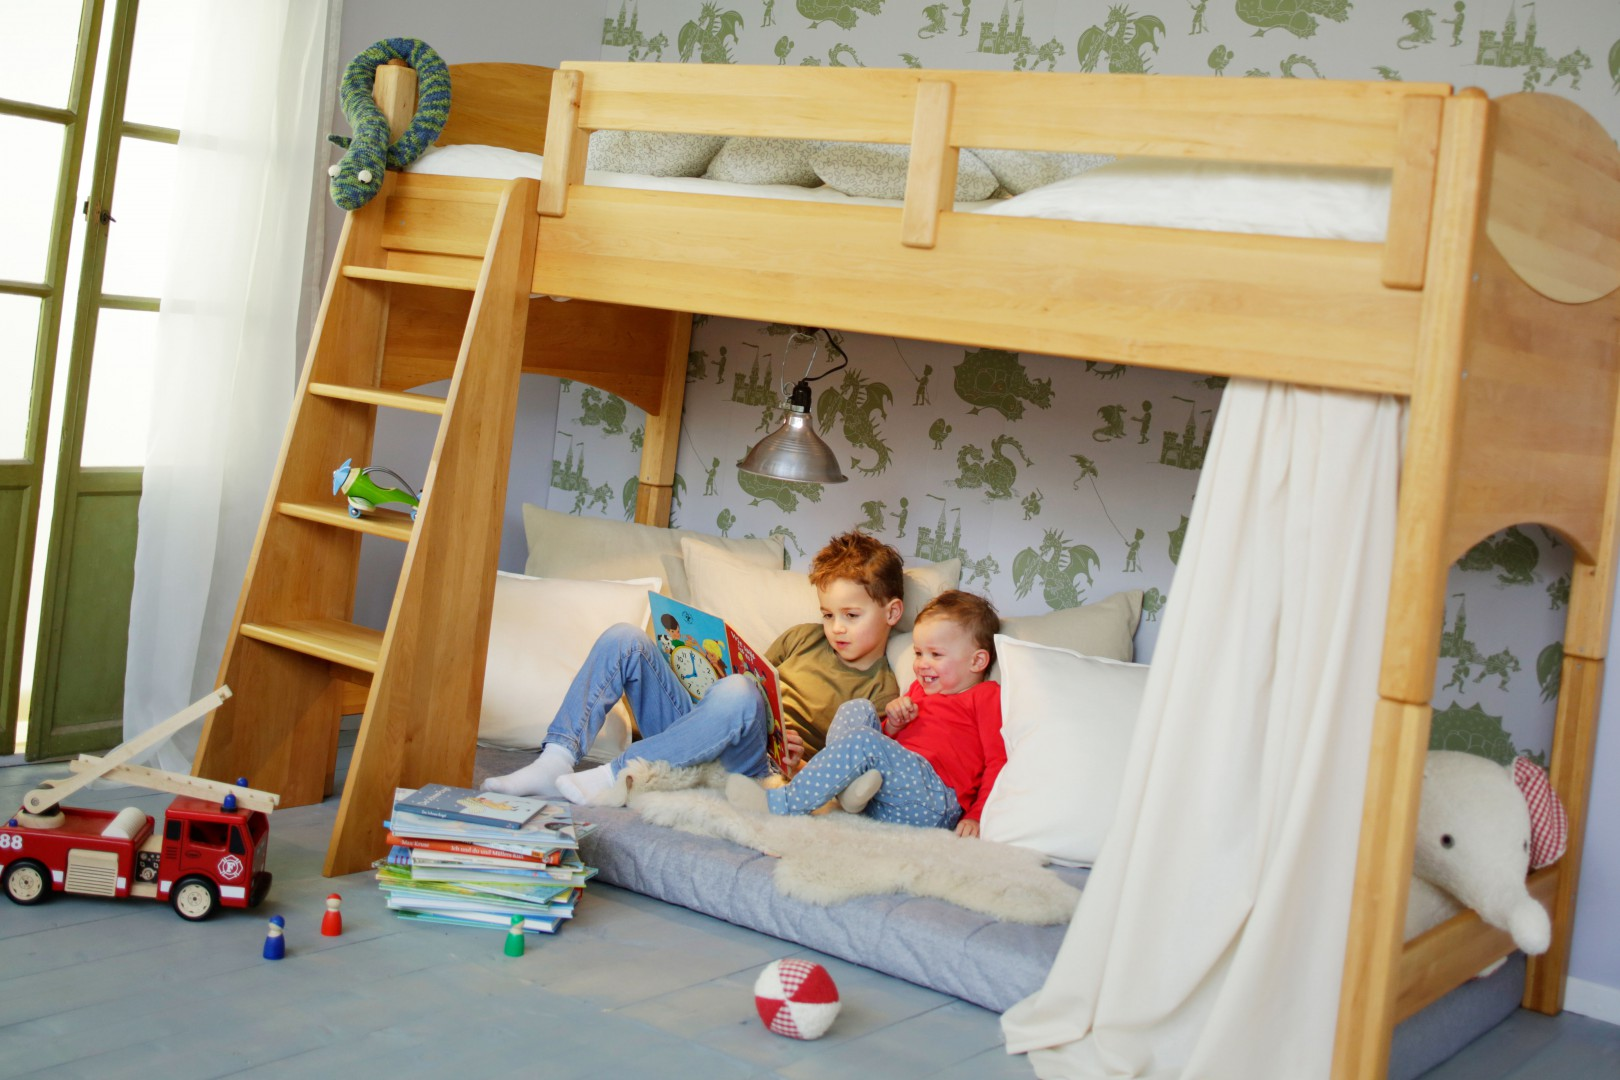 Full Size of Kinderzimmer Hochbett Bioset Noah 120 Cm Erle Regal Weiß Regale Sofa Kinderzimmer Kinderzimmer Hochbett